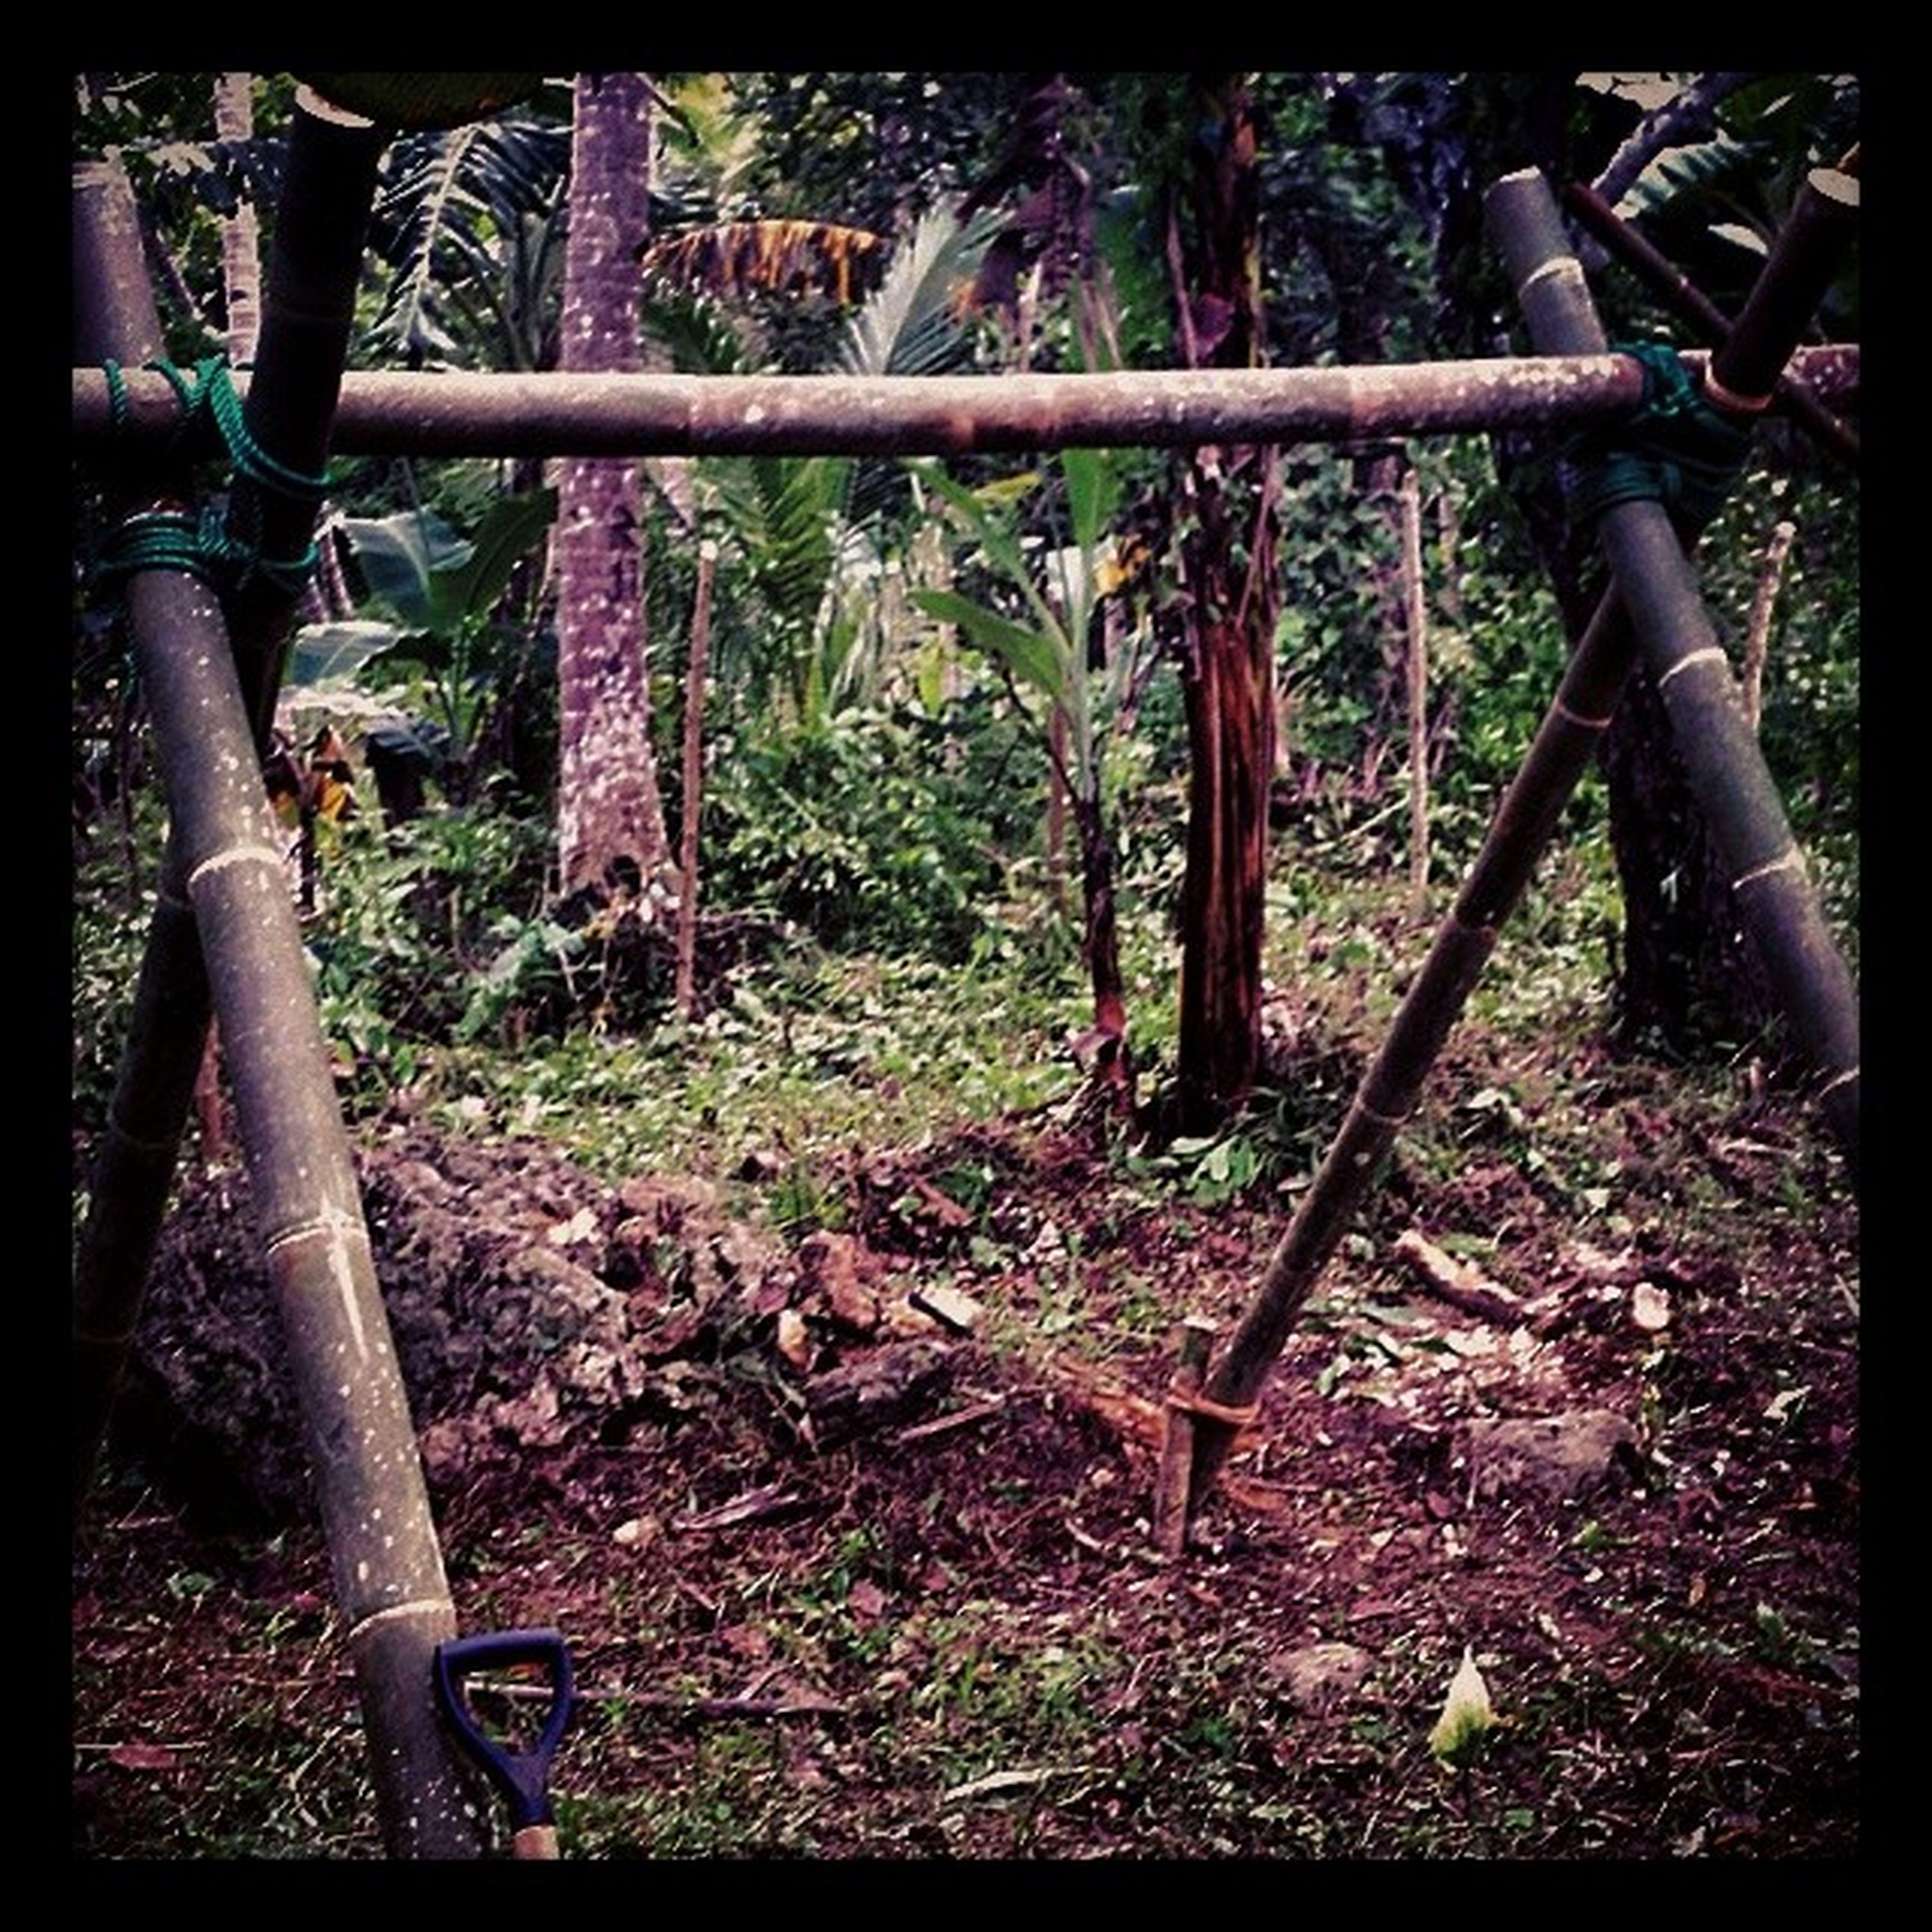 Streetfighterassassinsfist Chinupbar Bamboo Philippines Gym Akuma